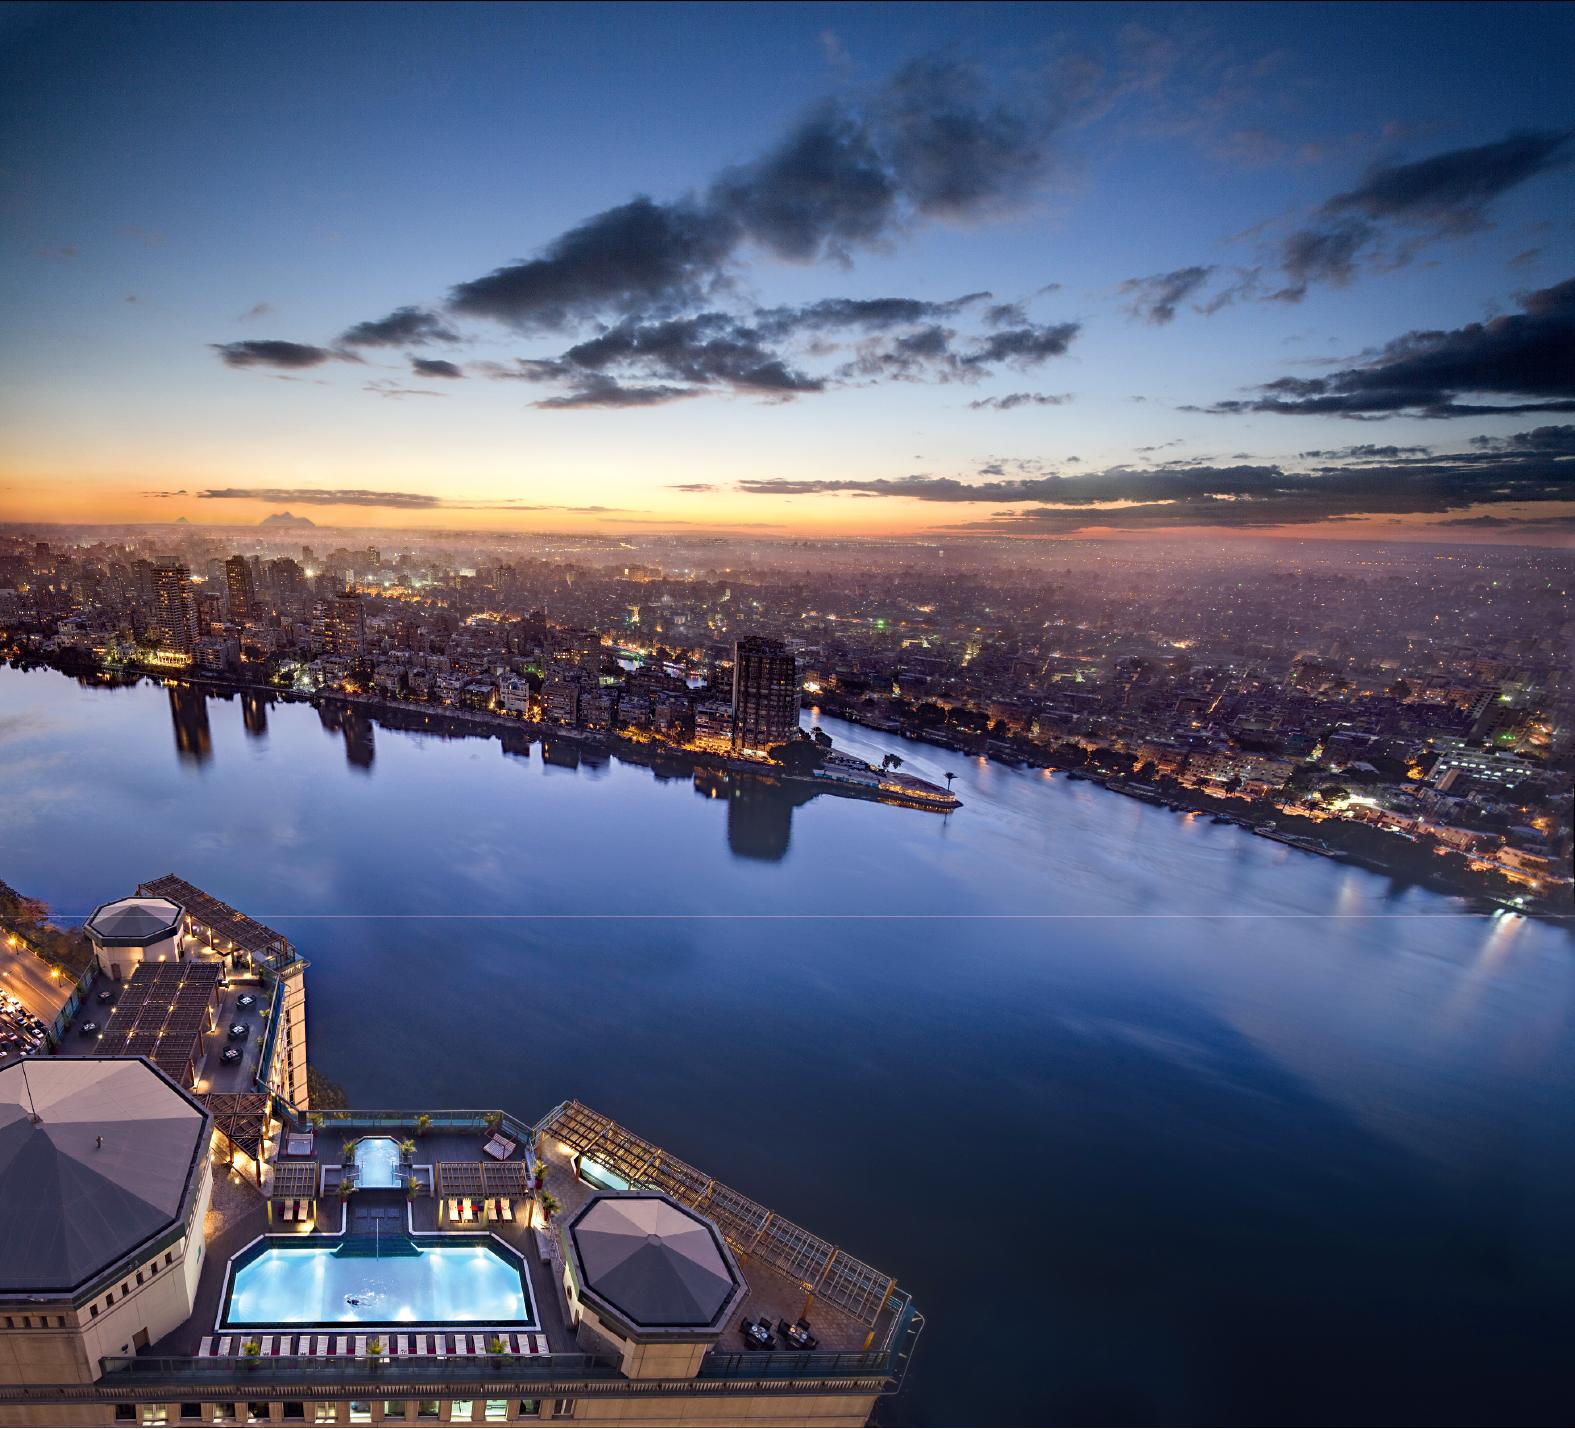 Vista aérea do hotel Fairmont Nile City, Cairo, Egito